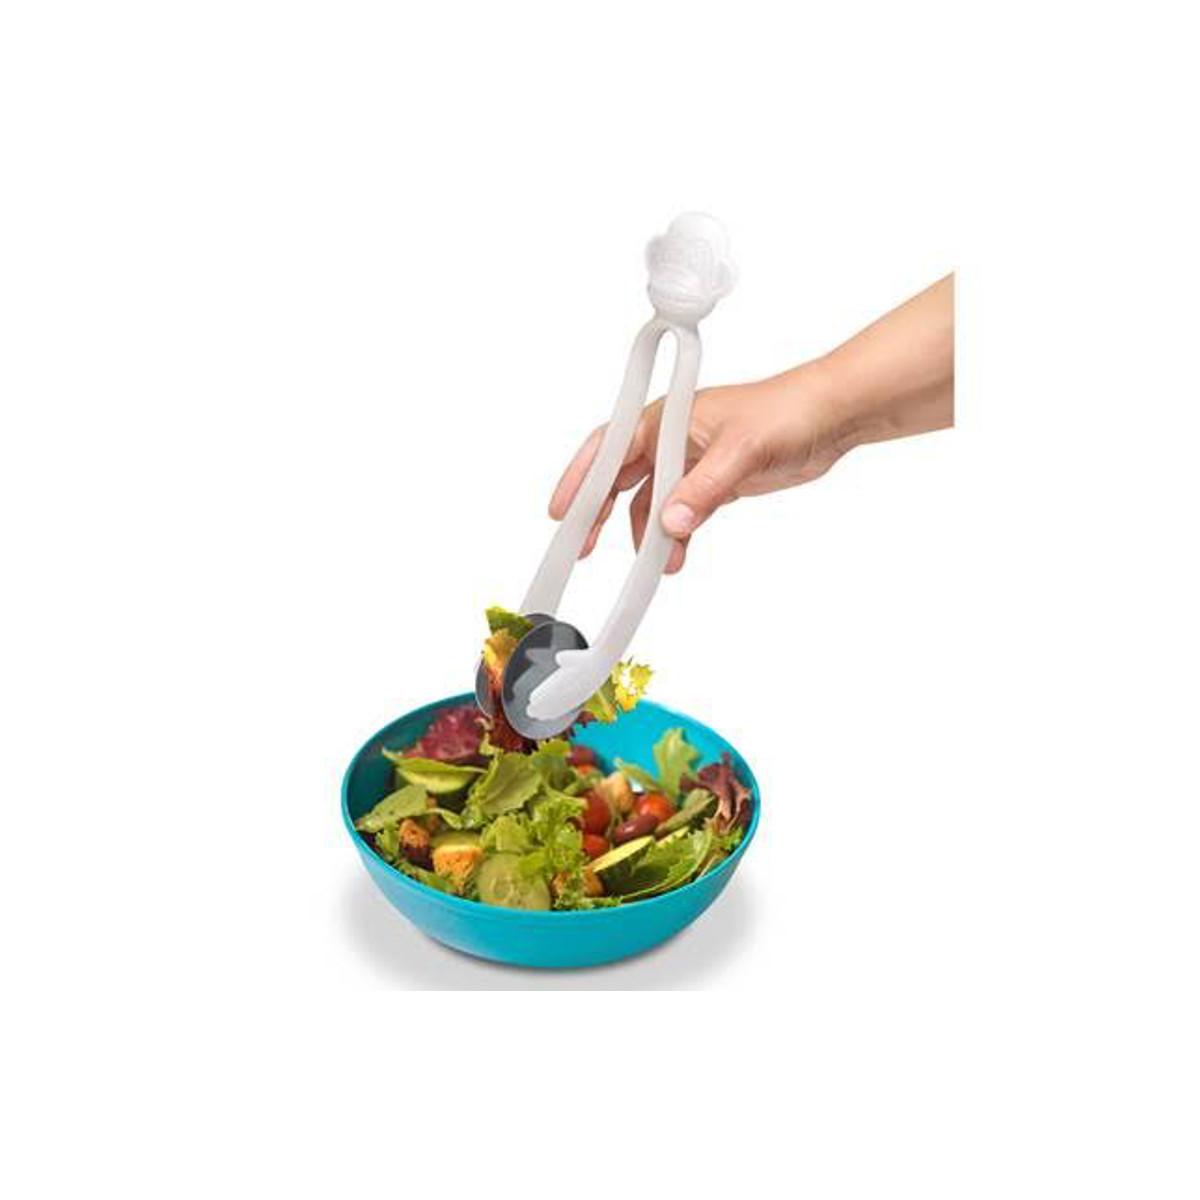 Salatbestik formet som en abe